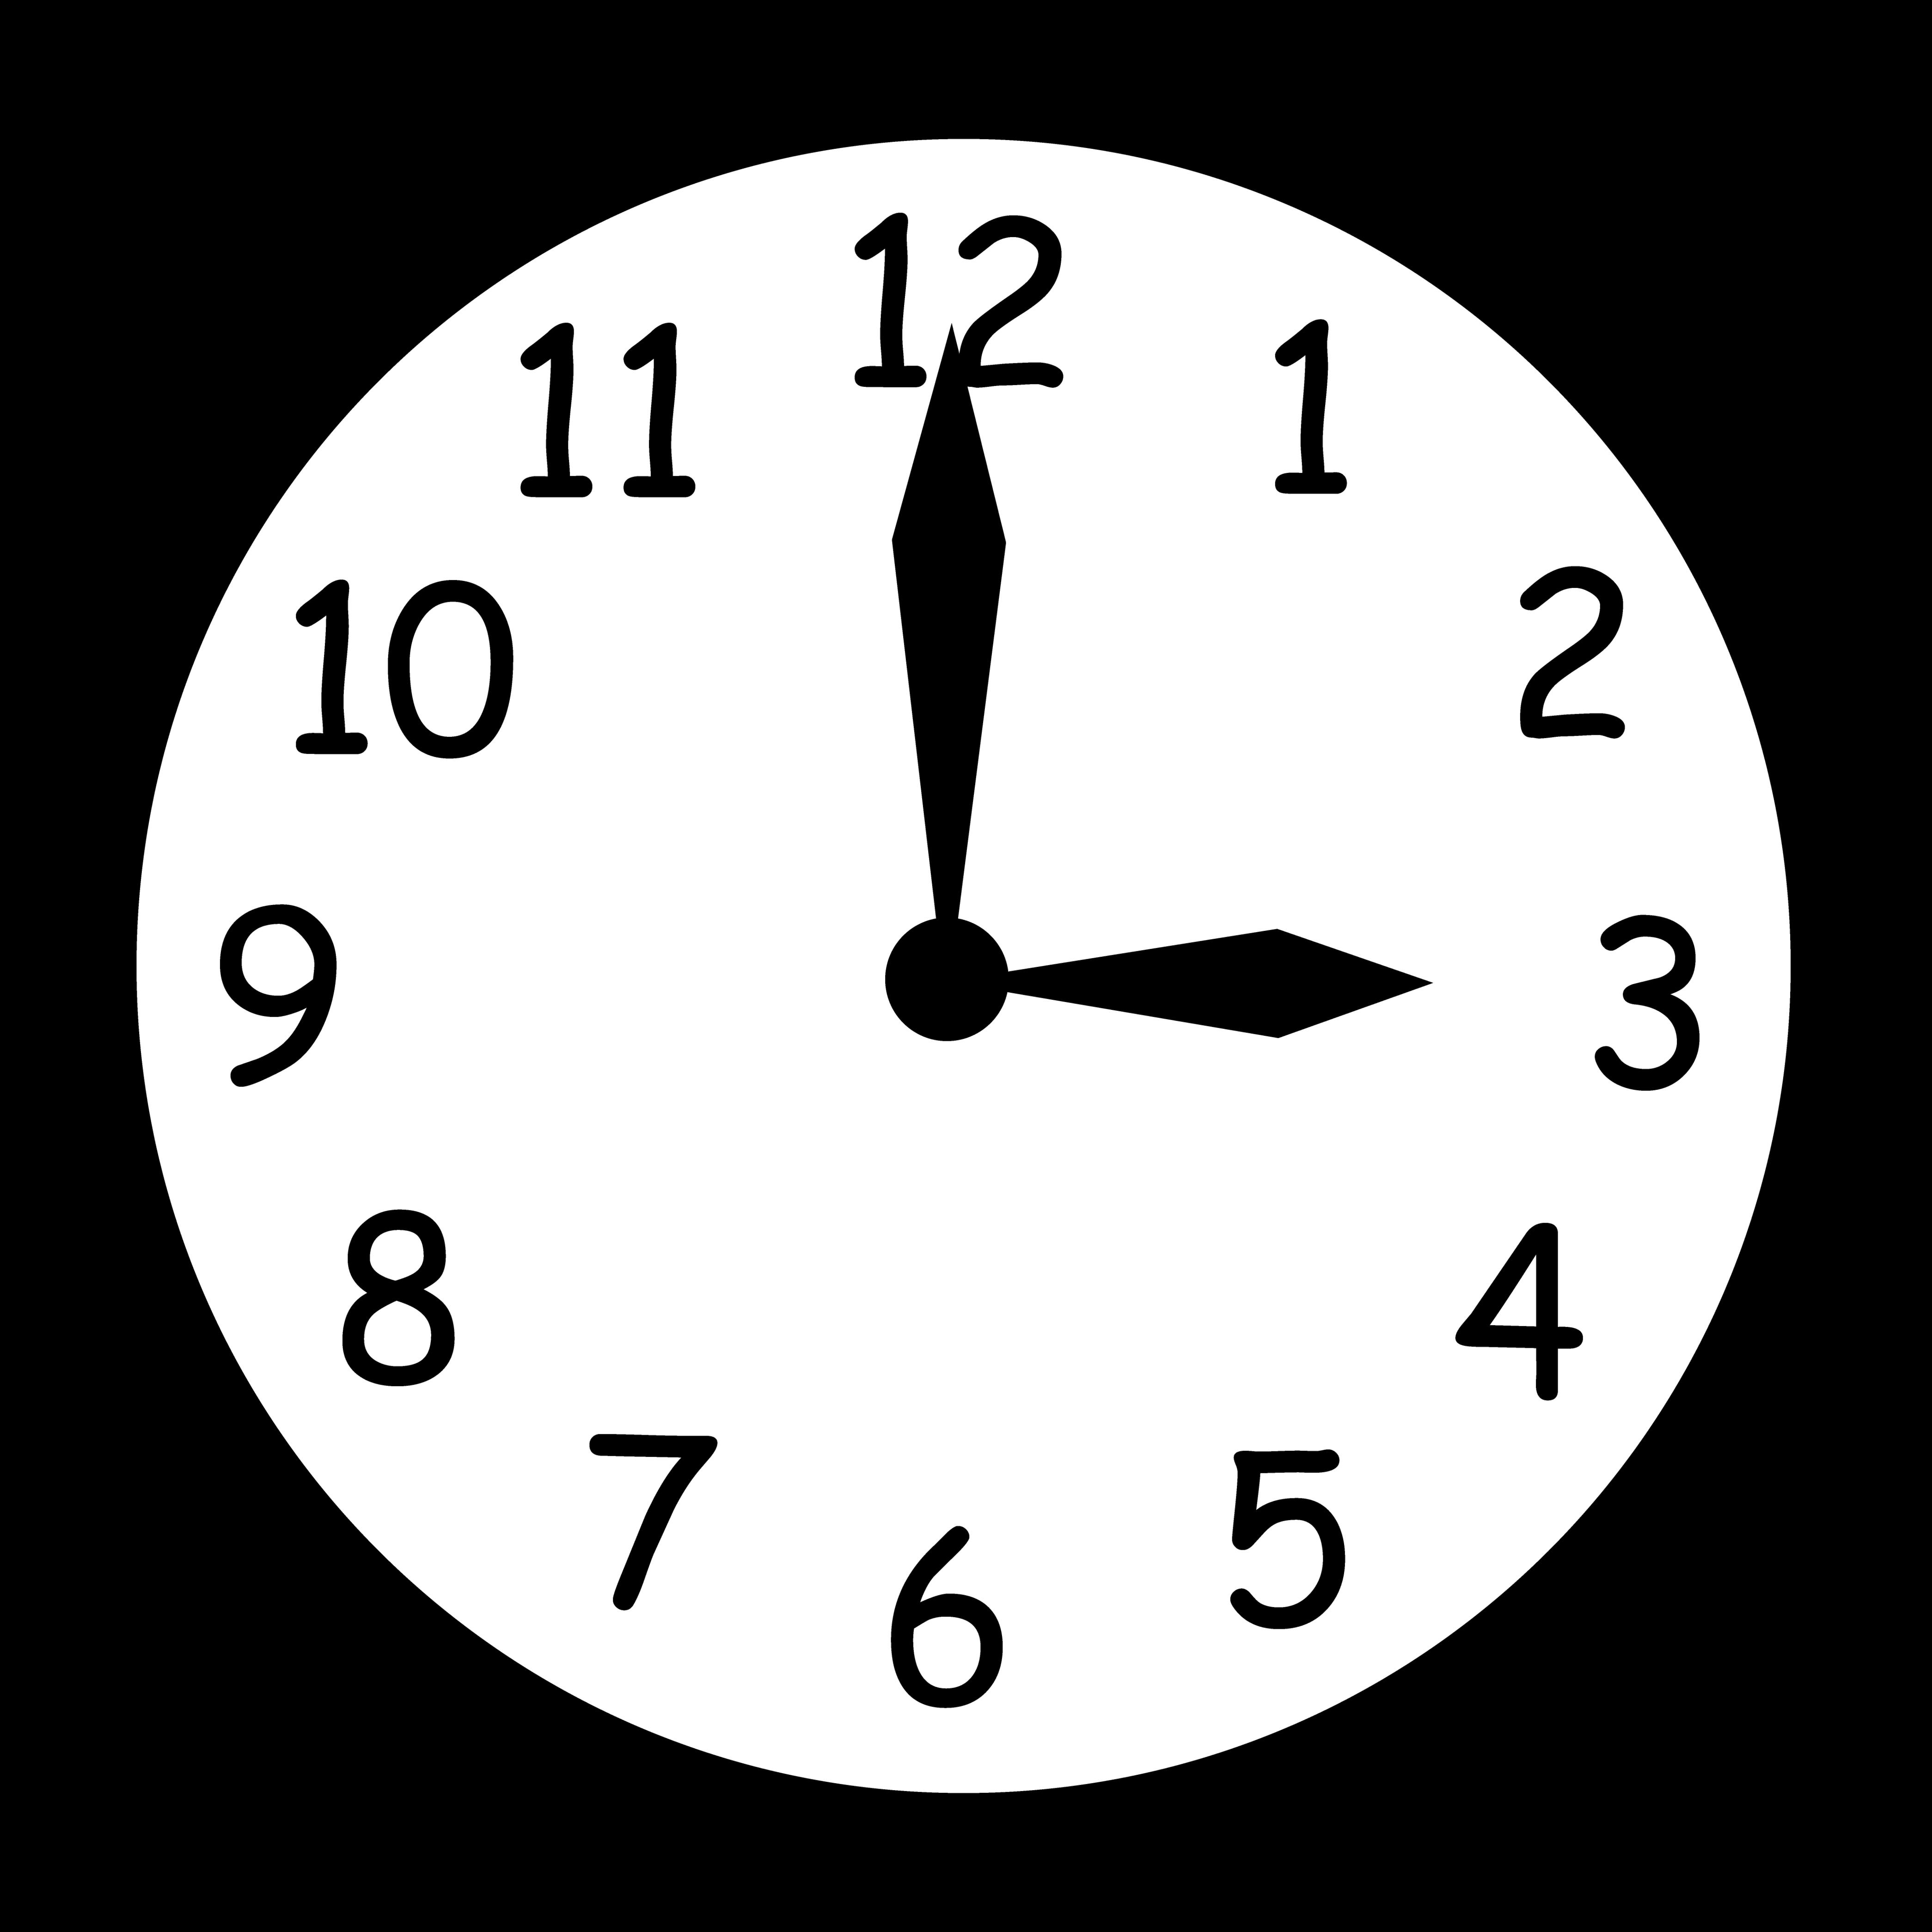 Clocks tired